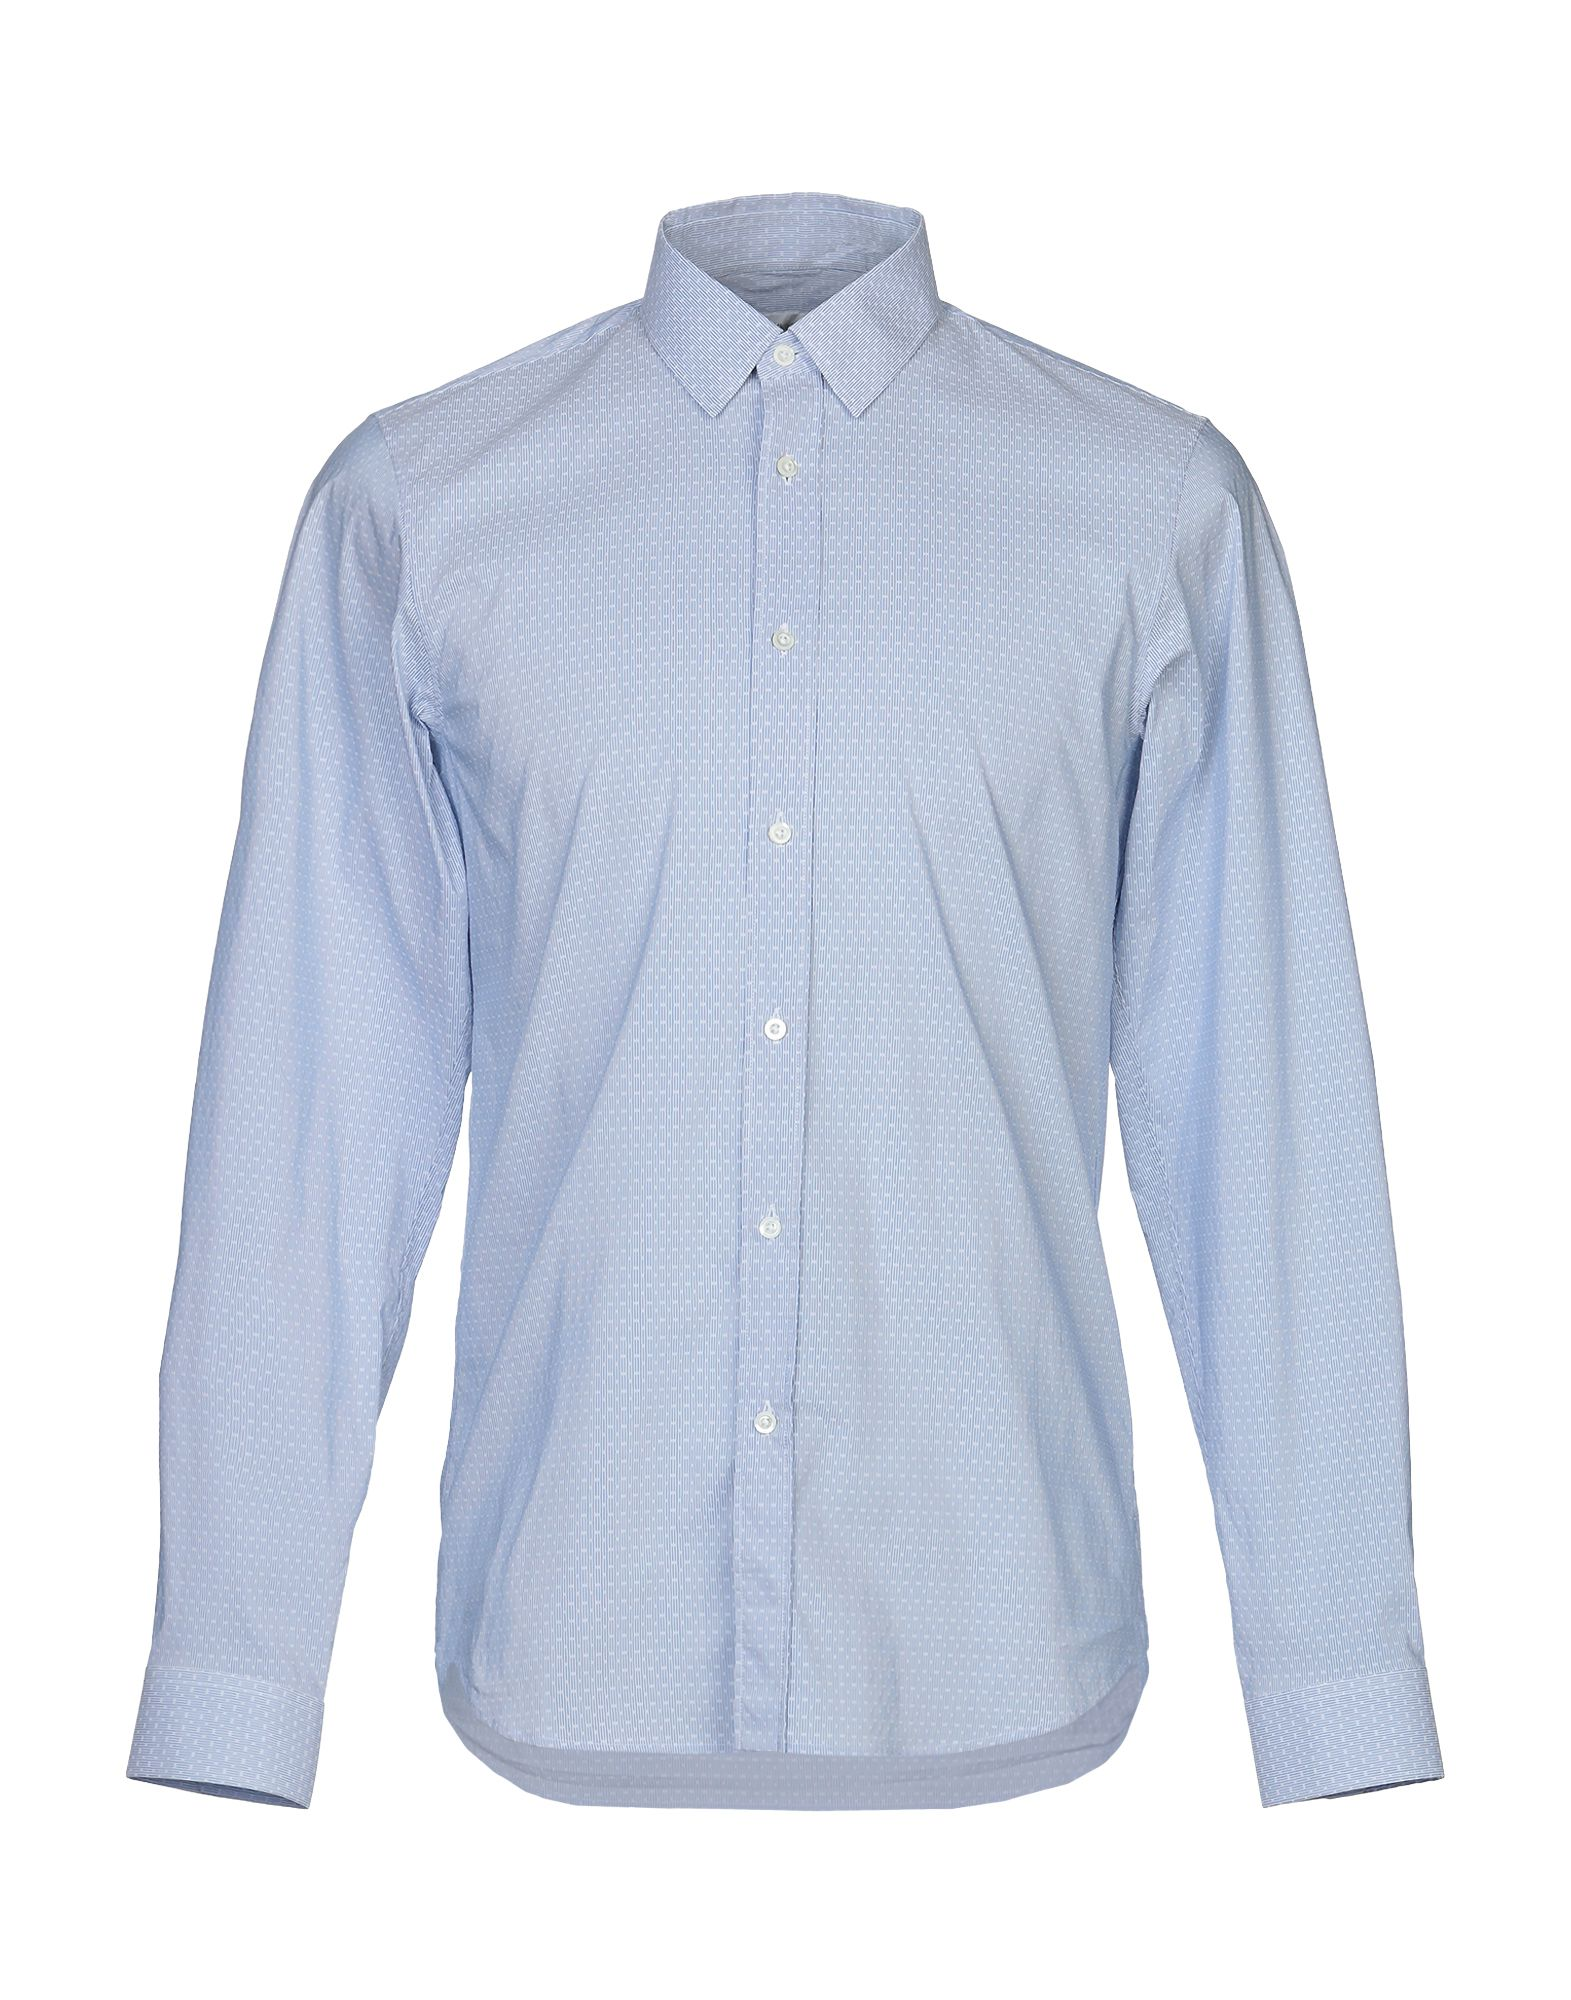 Camicia Fantasia Jil Jil Sander uomo - 38803277UI  gesund